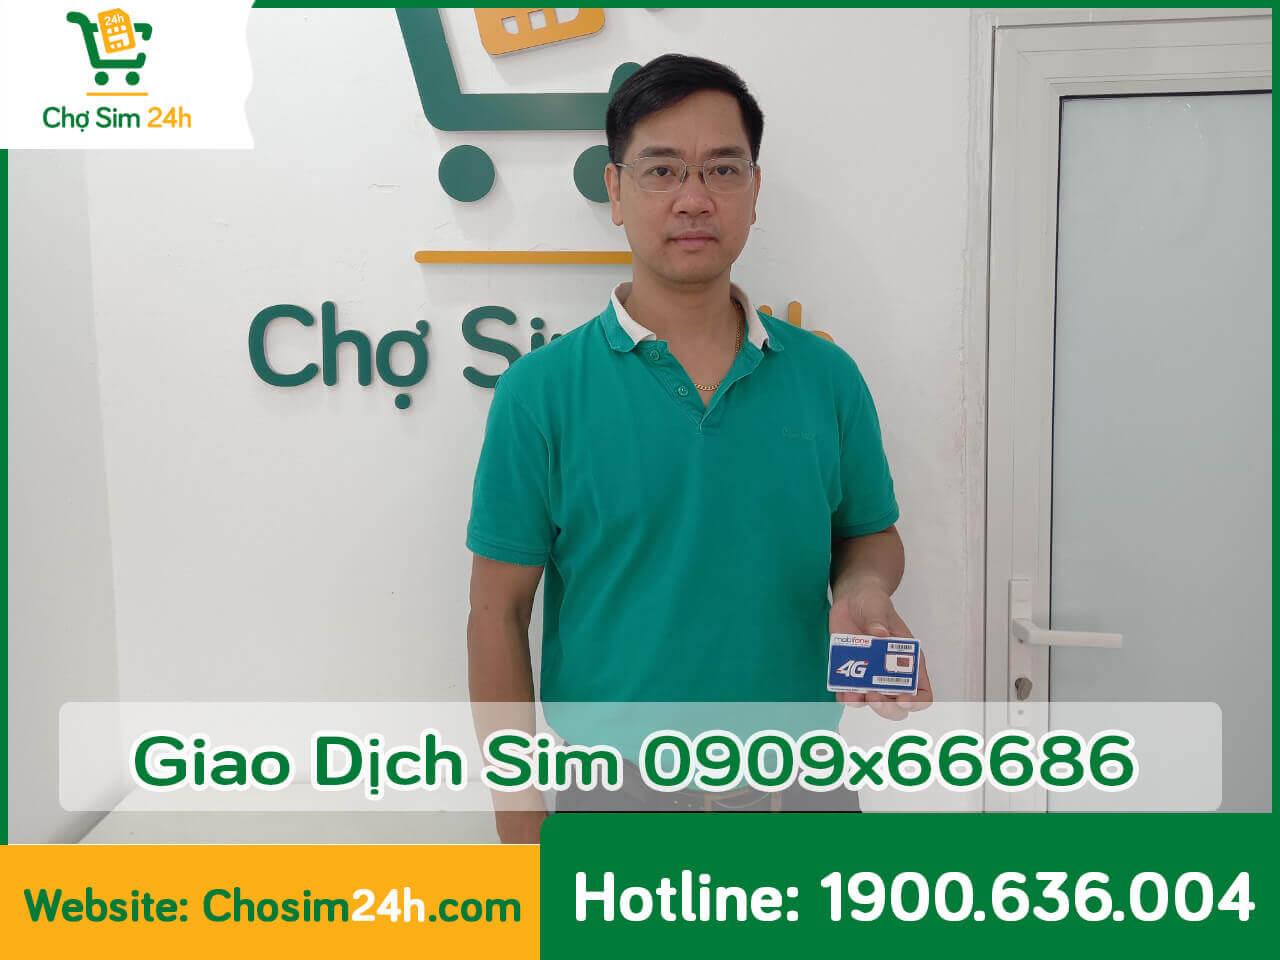 sim-loc-phat-0909x66686-chinh-thuc-ve-voi-chu-nhan-sai-thanh-1-1